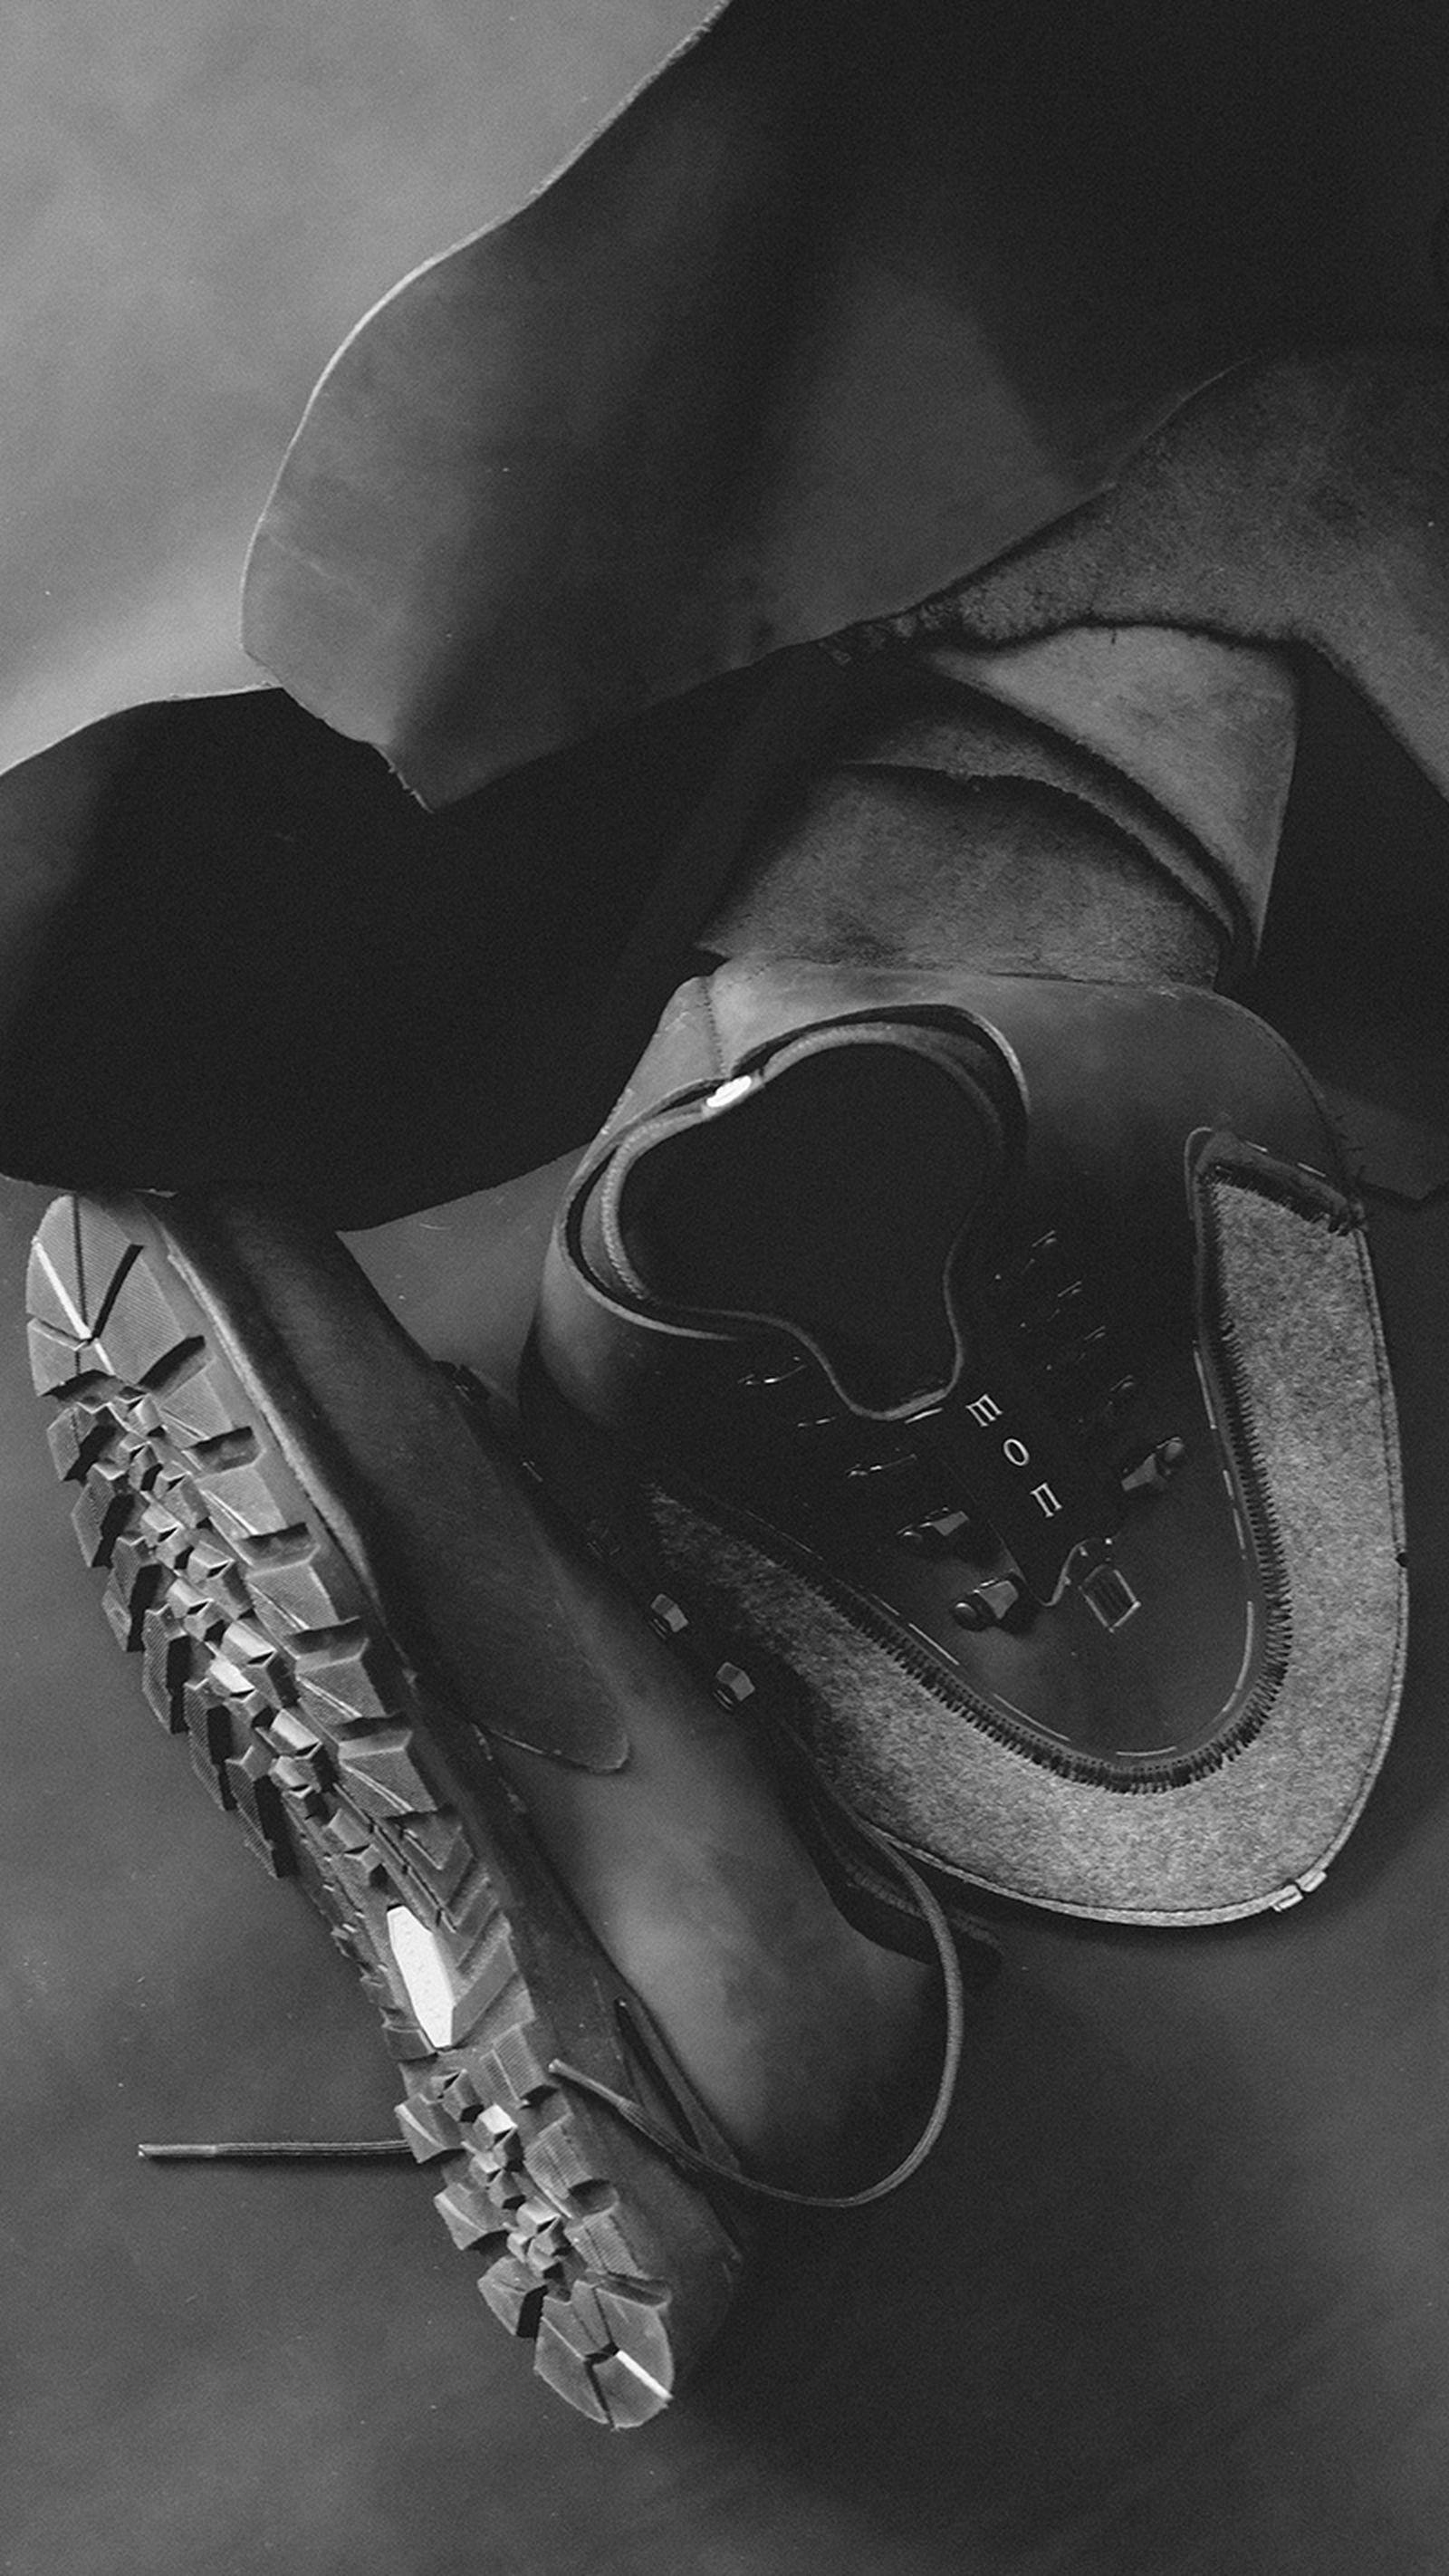 demon-hiking-footwear-interview-05